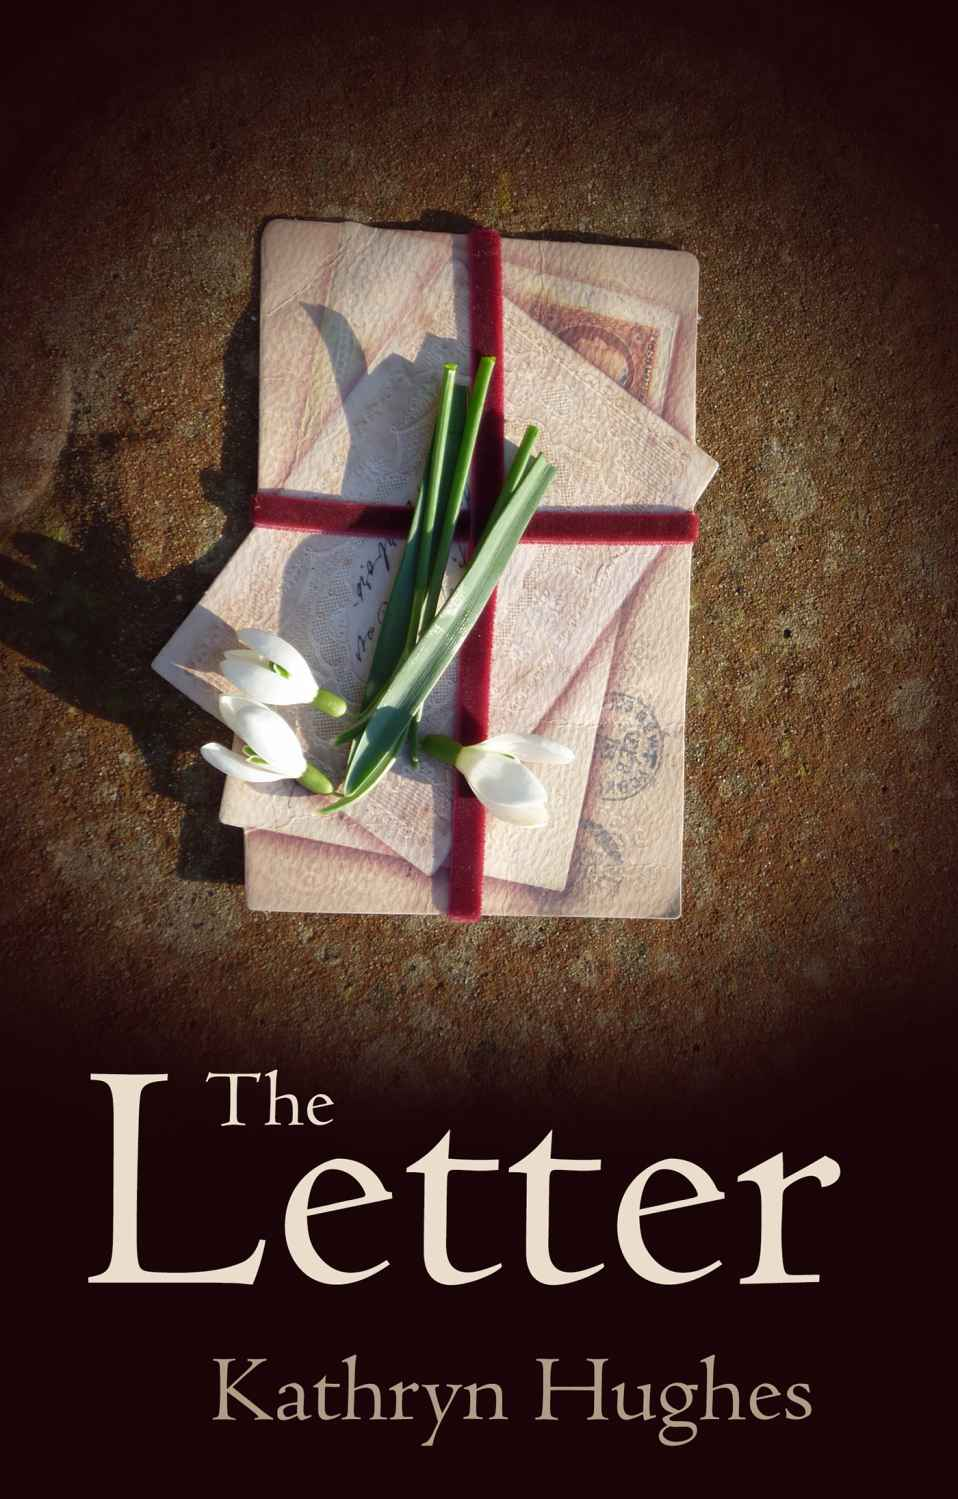 The Letter - Kathryn Hughes [kindle] [mobi]